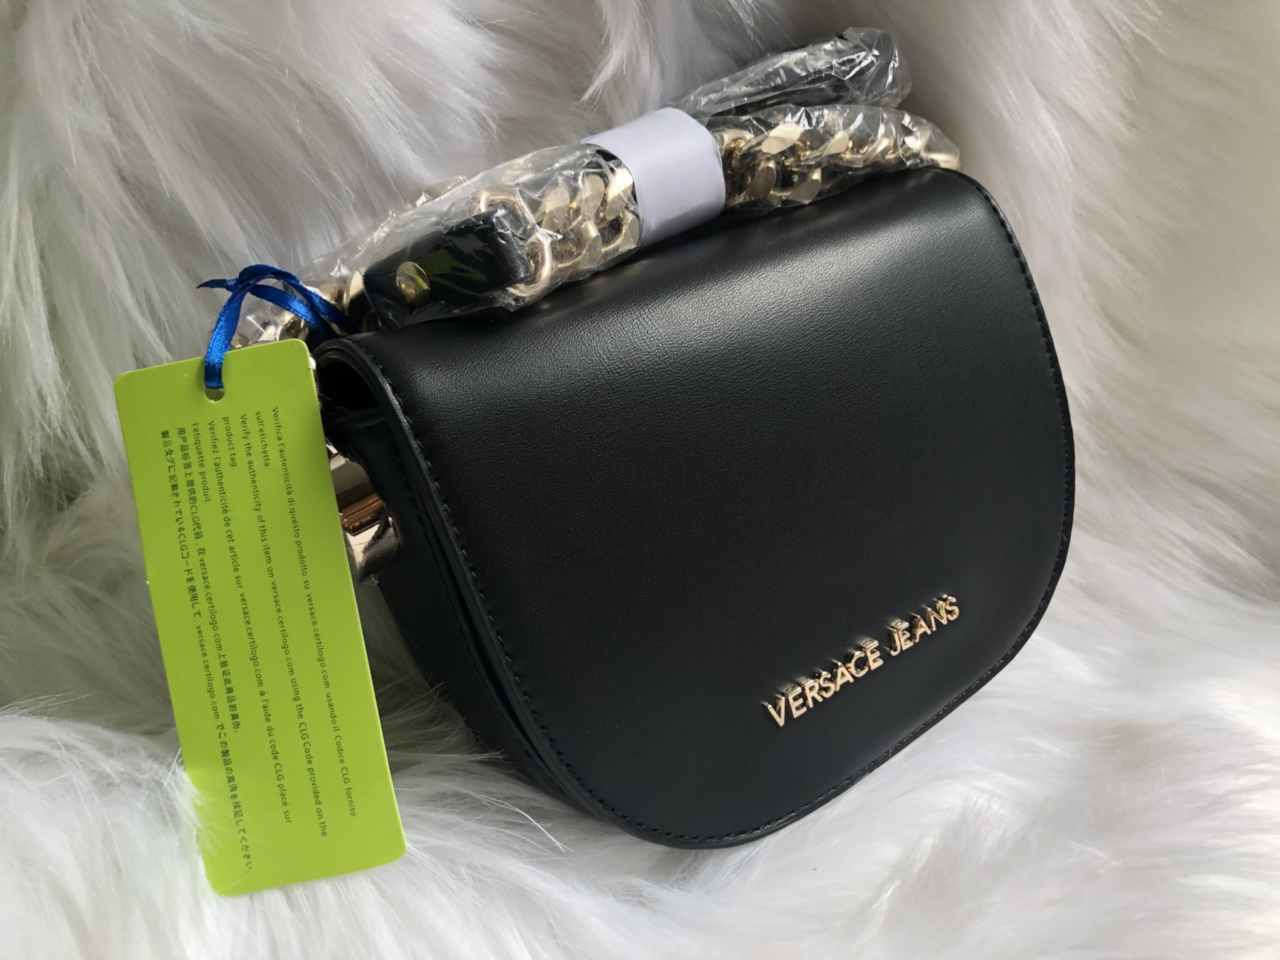 Túi Versace Jeans bán nguyệt - XK688